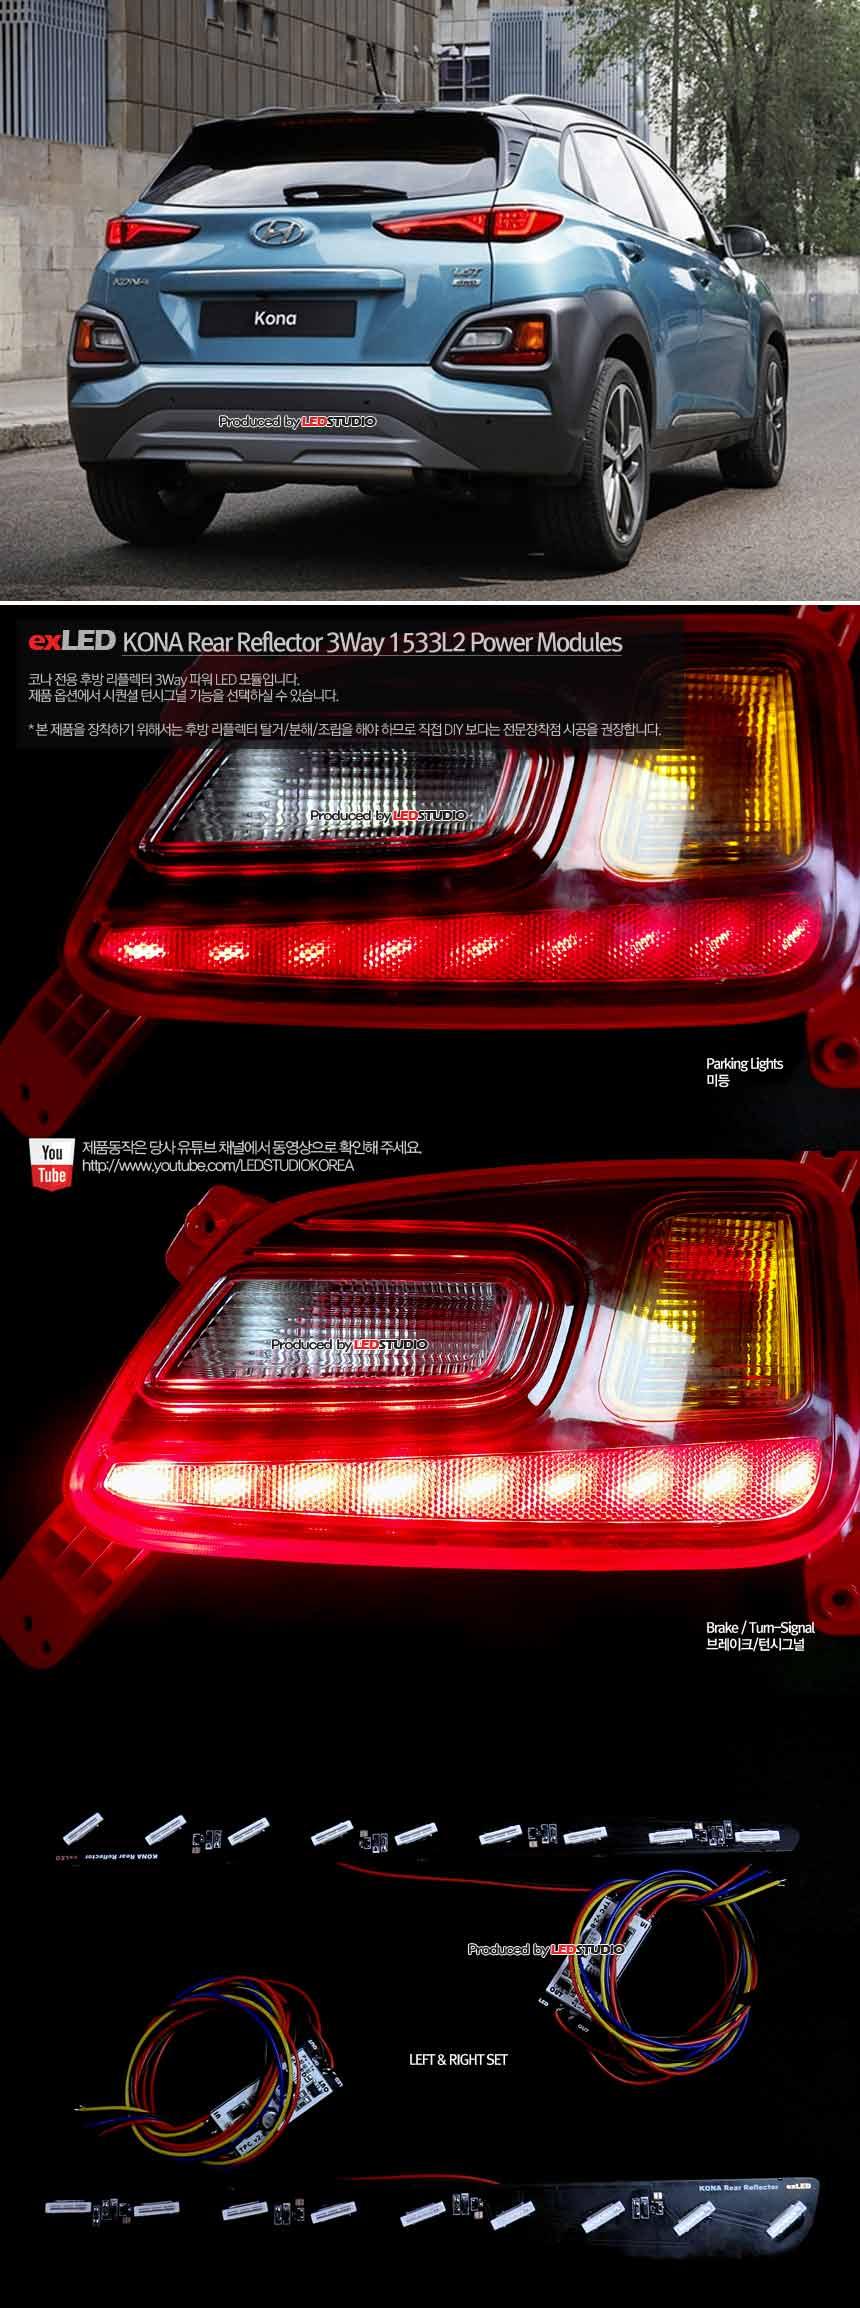 exLED 코나 1533L2 파워 LED 후방 리플렉터 3Way 모듈(시퀀셜 옵션)